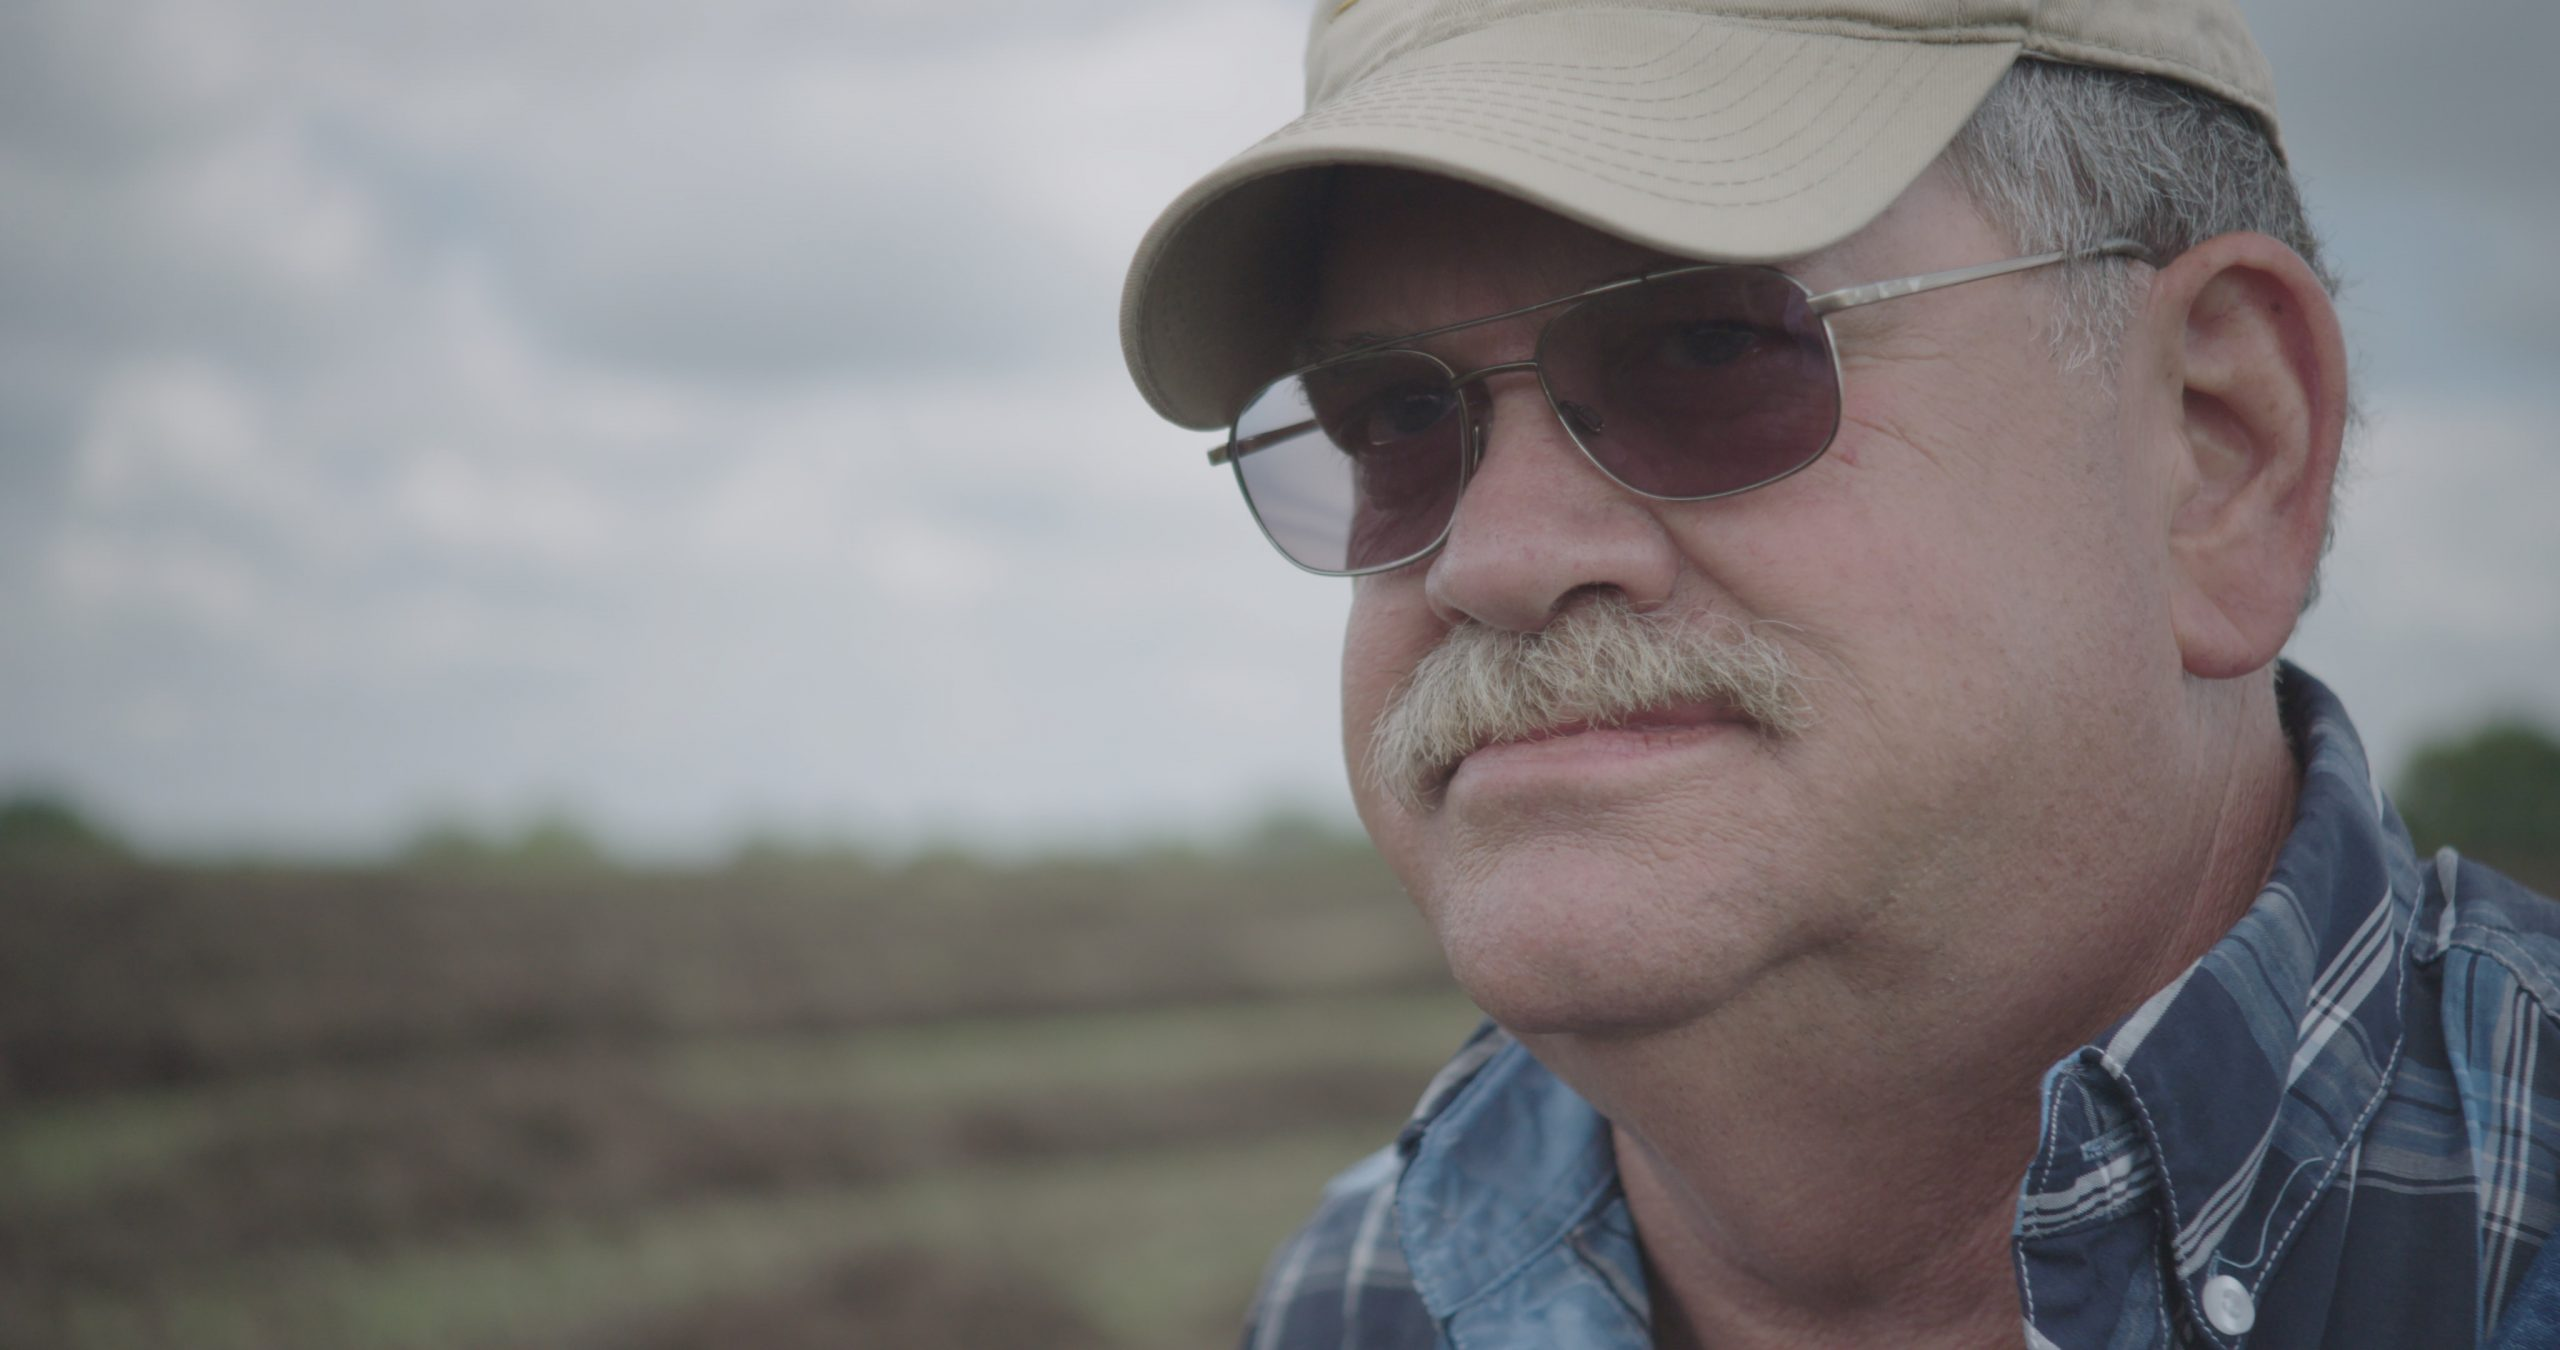 Kansas farmer Donn Teske, who operates a family farm in Pottawatomie County, is featured in the documentary film